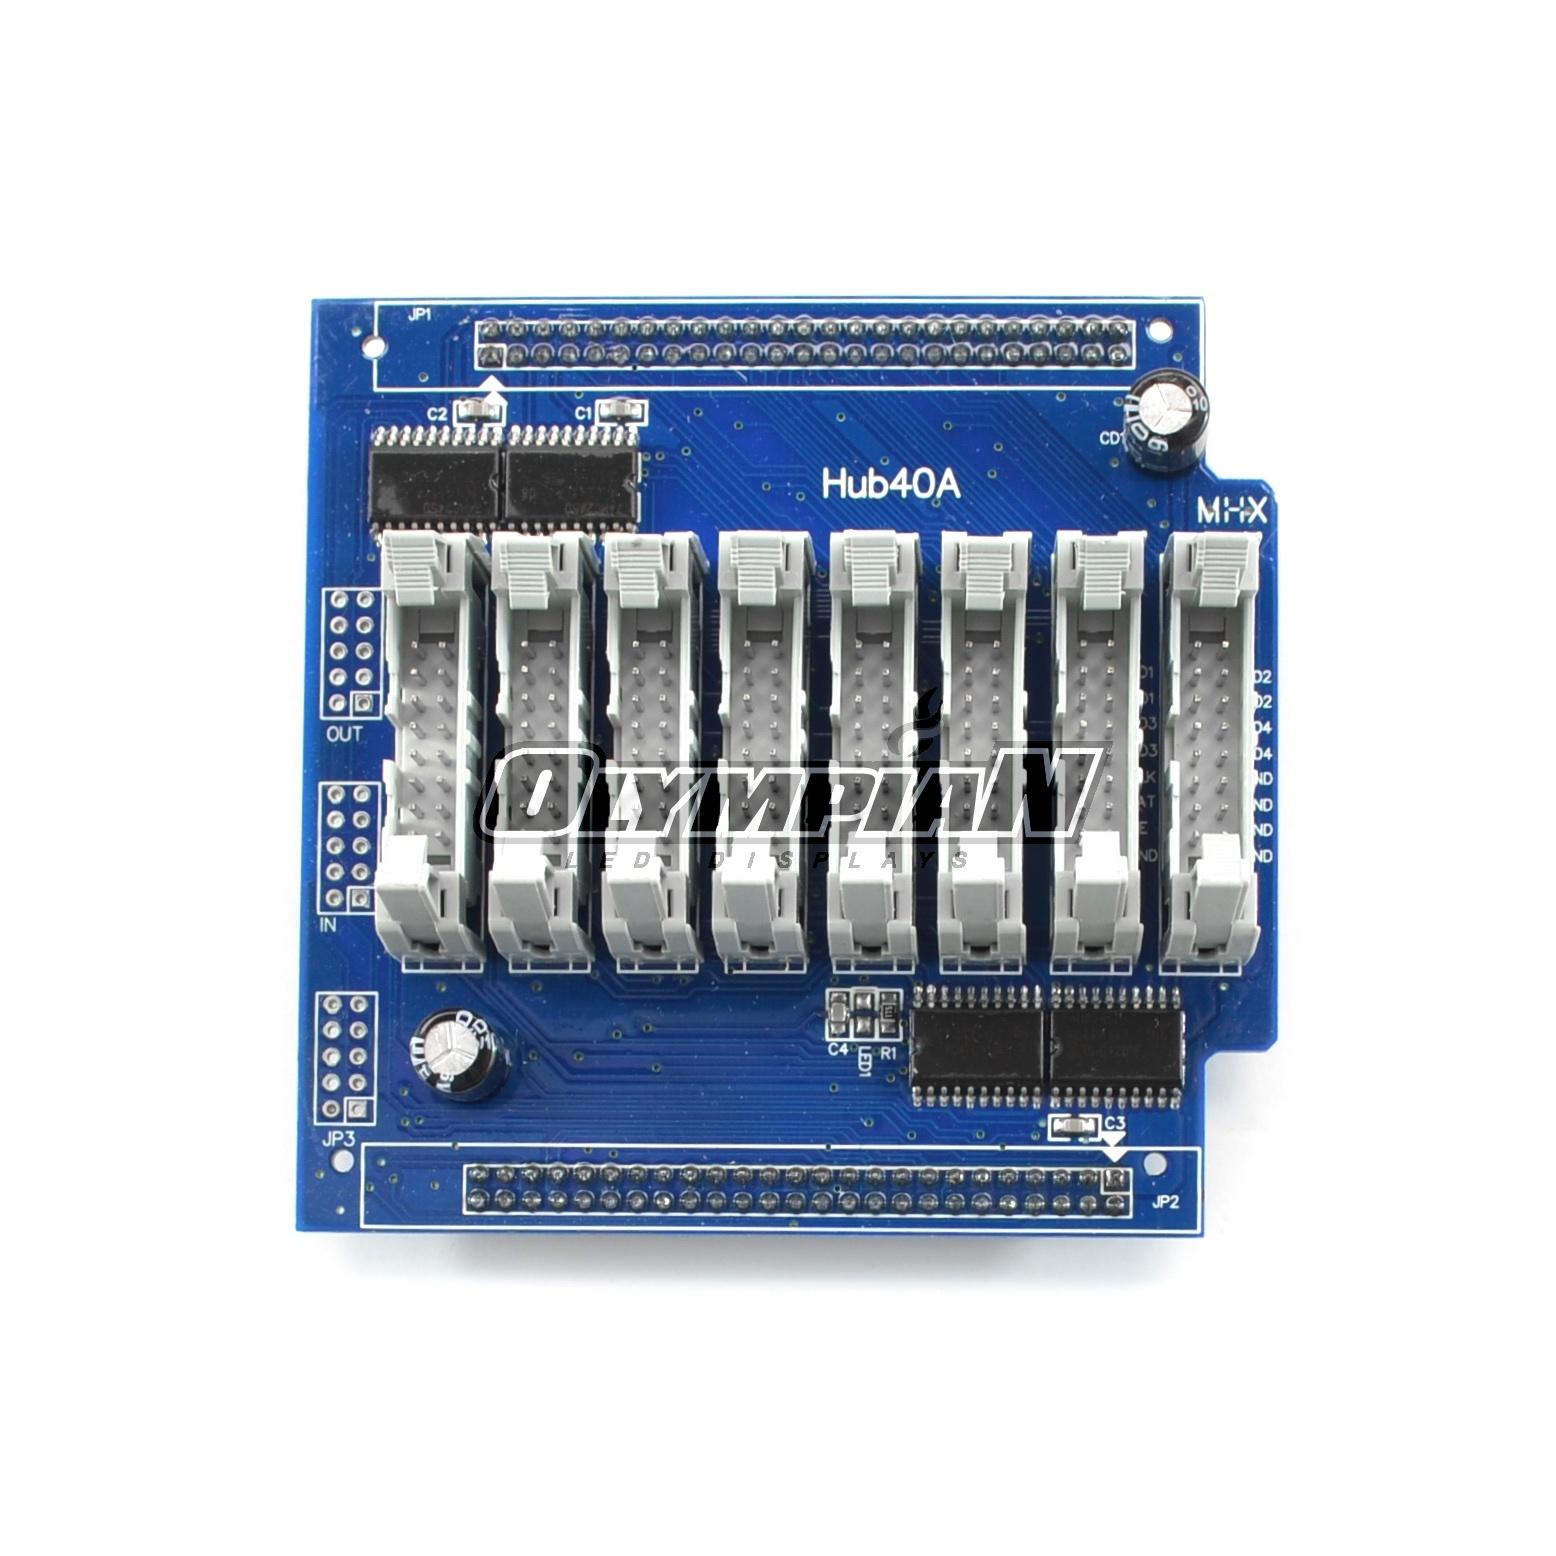 HUB 40A LED Hub Card for NovaStar / Xixun / DBStar / Linsn